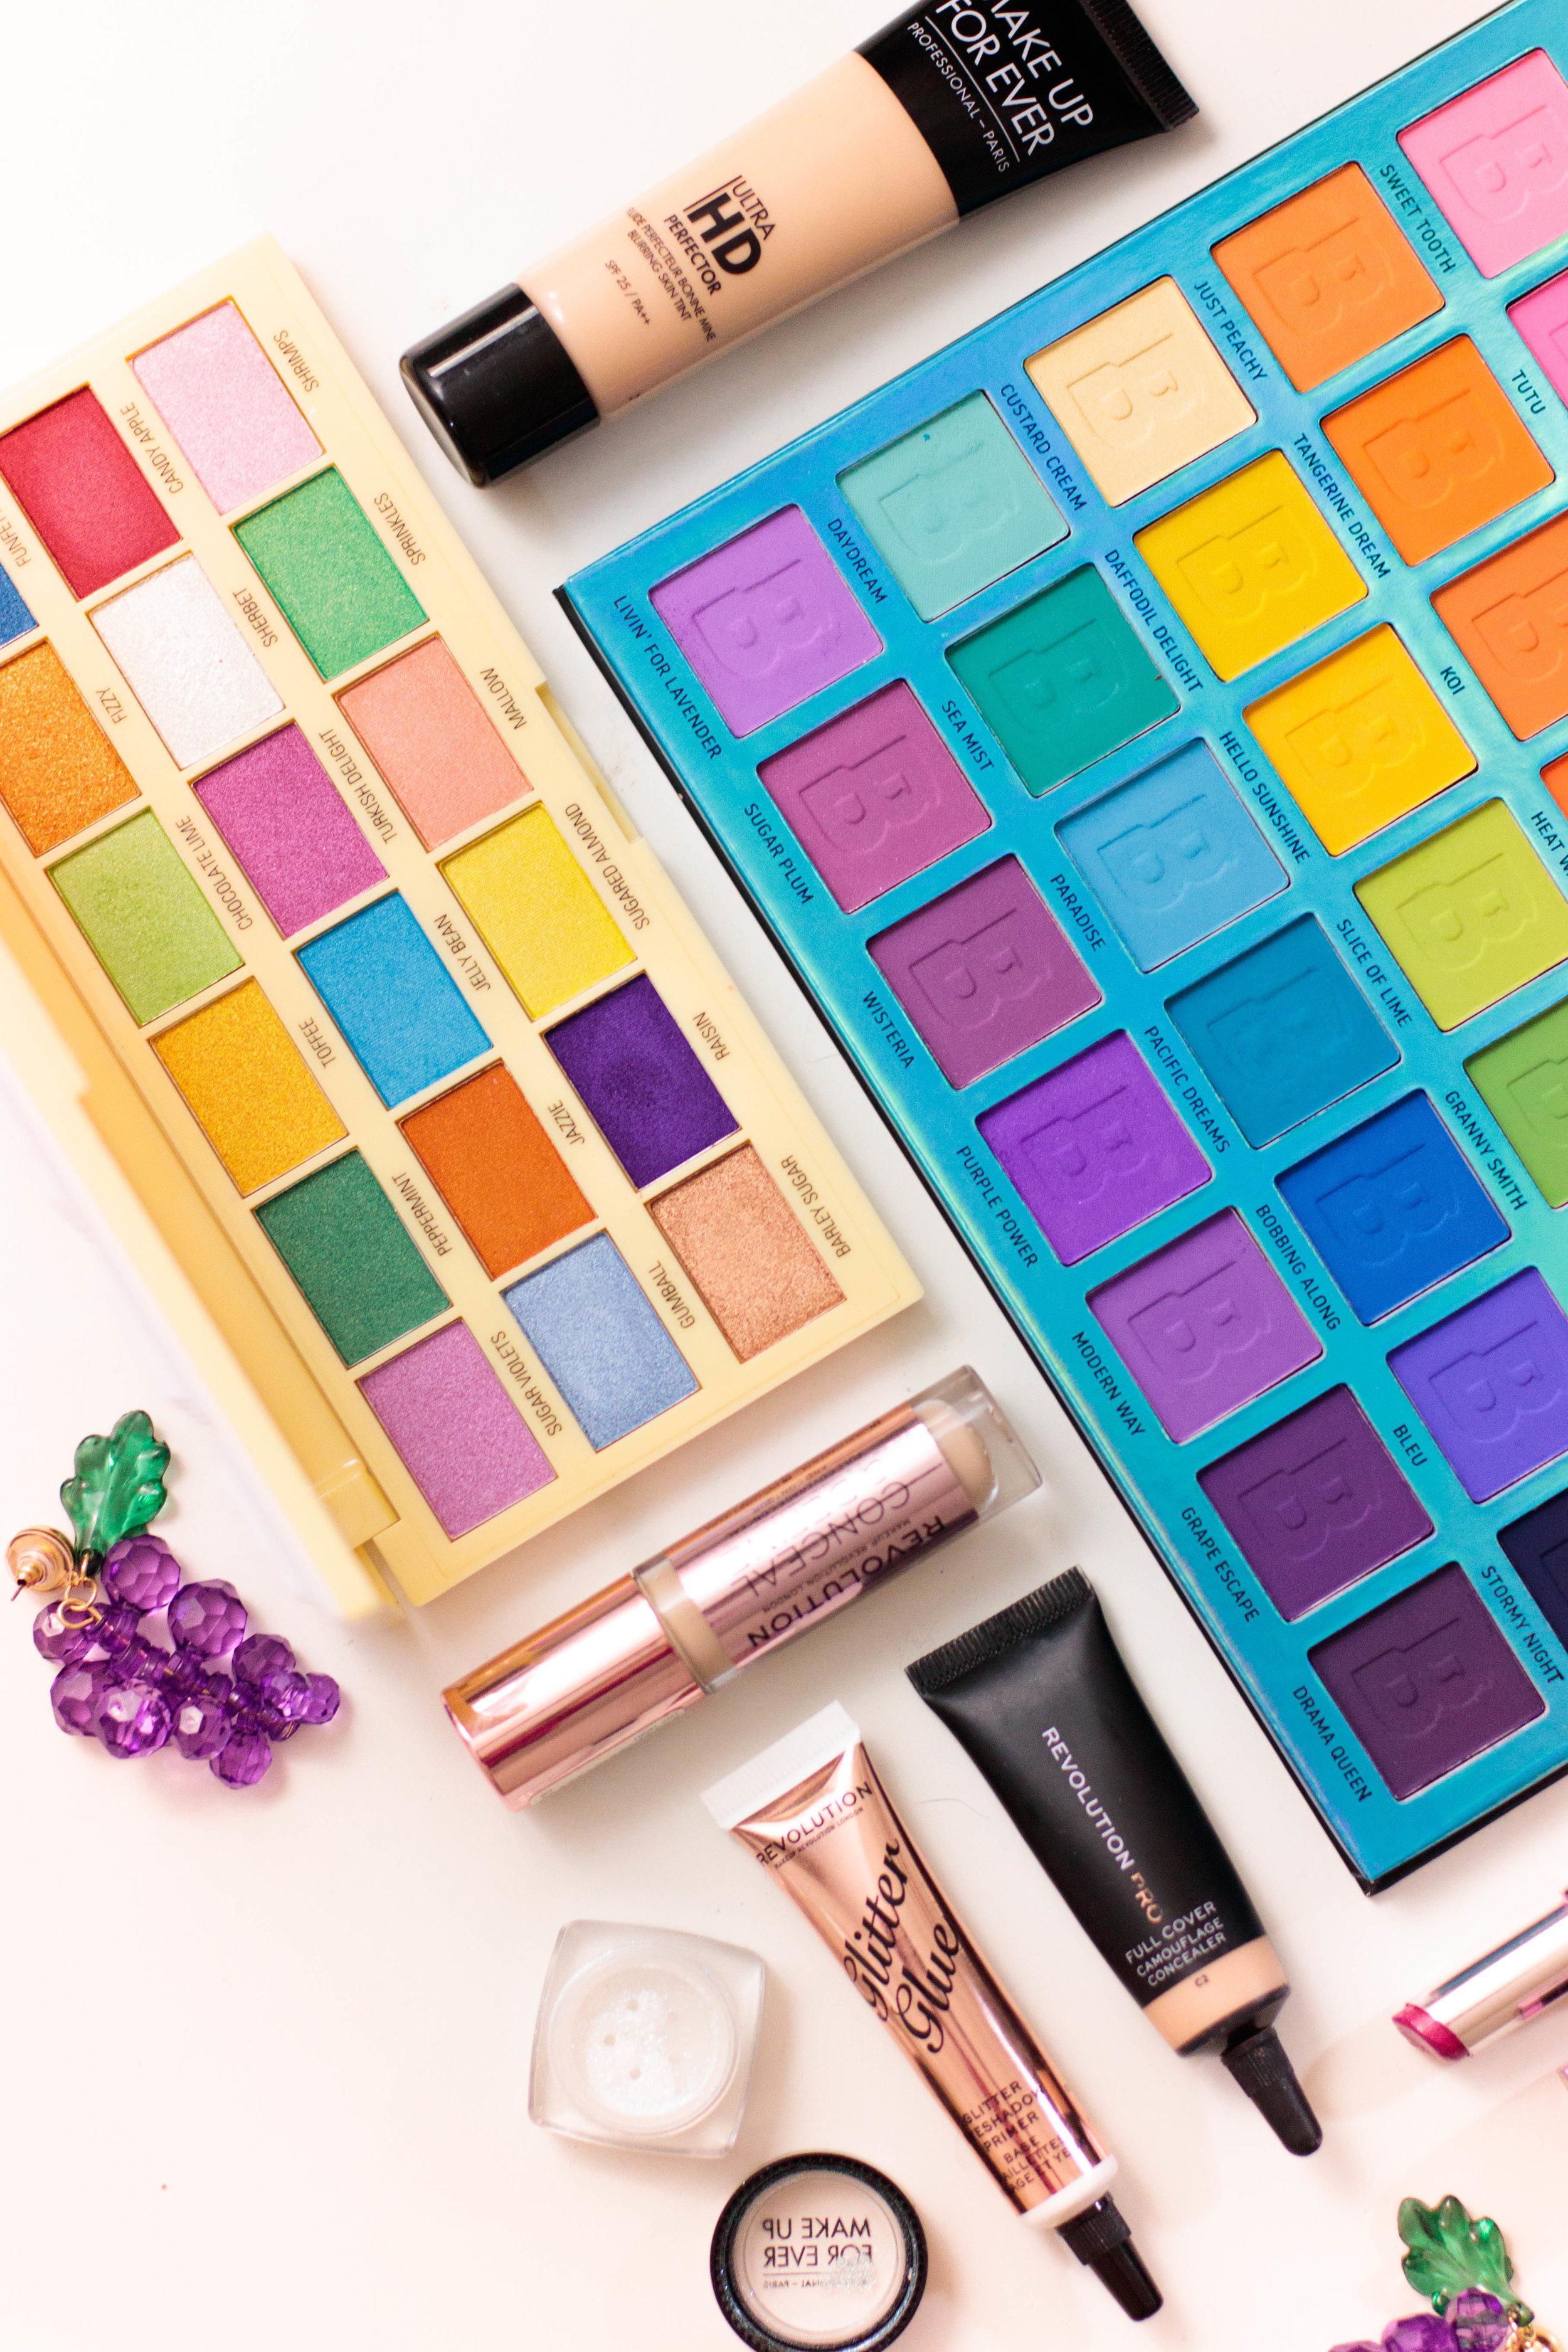 pauuulette-beauty-bay-makeup-revolution-mufe-dior-2.jpg